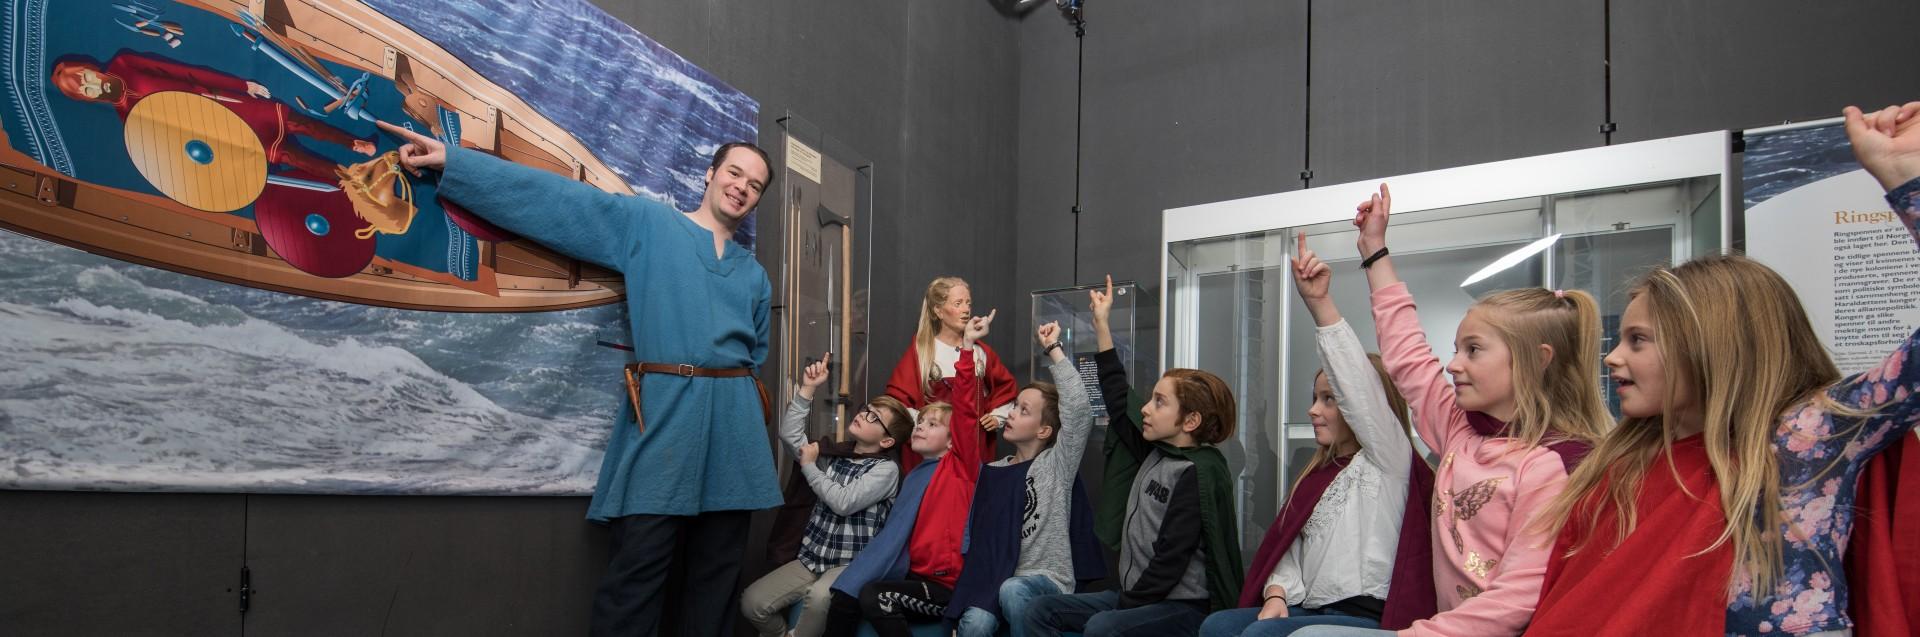 Elever får undervisning på Arkeologisk museum